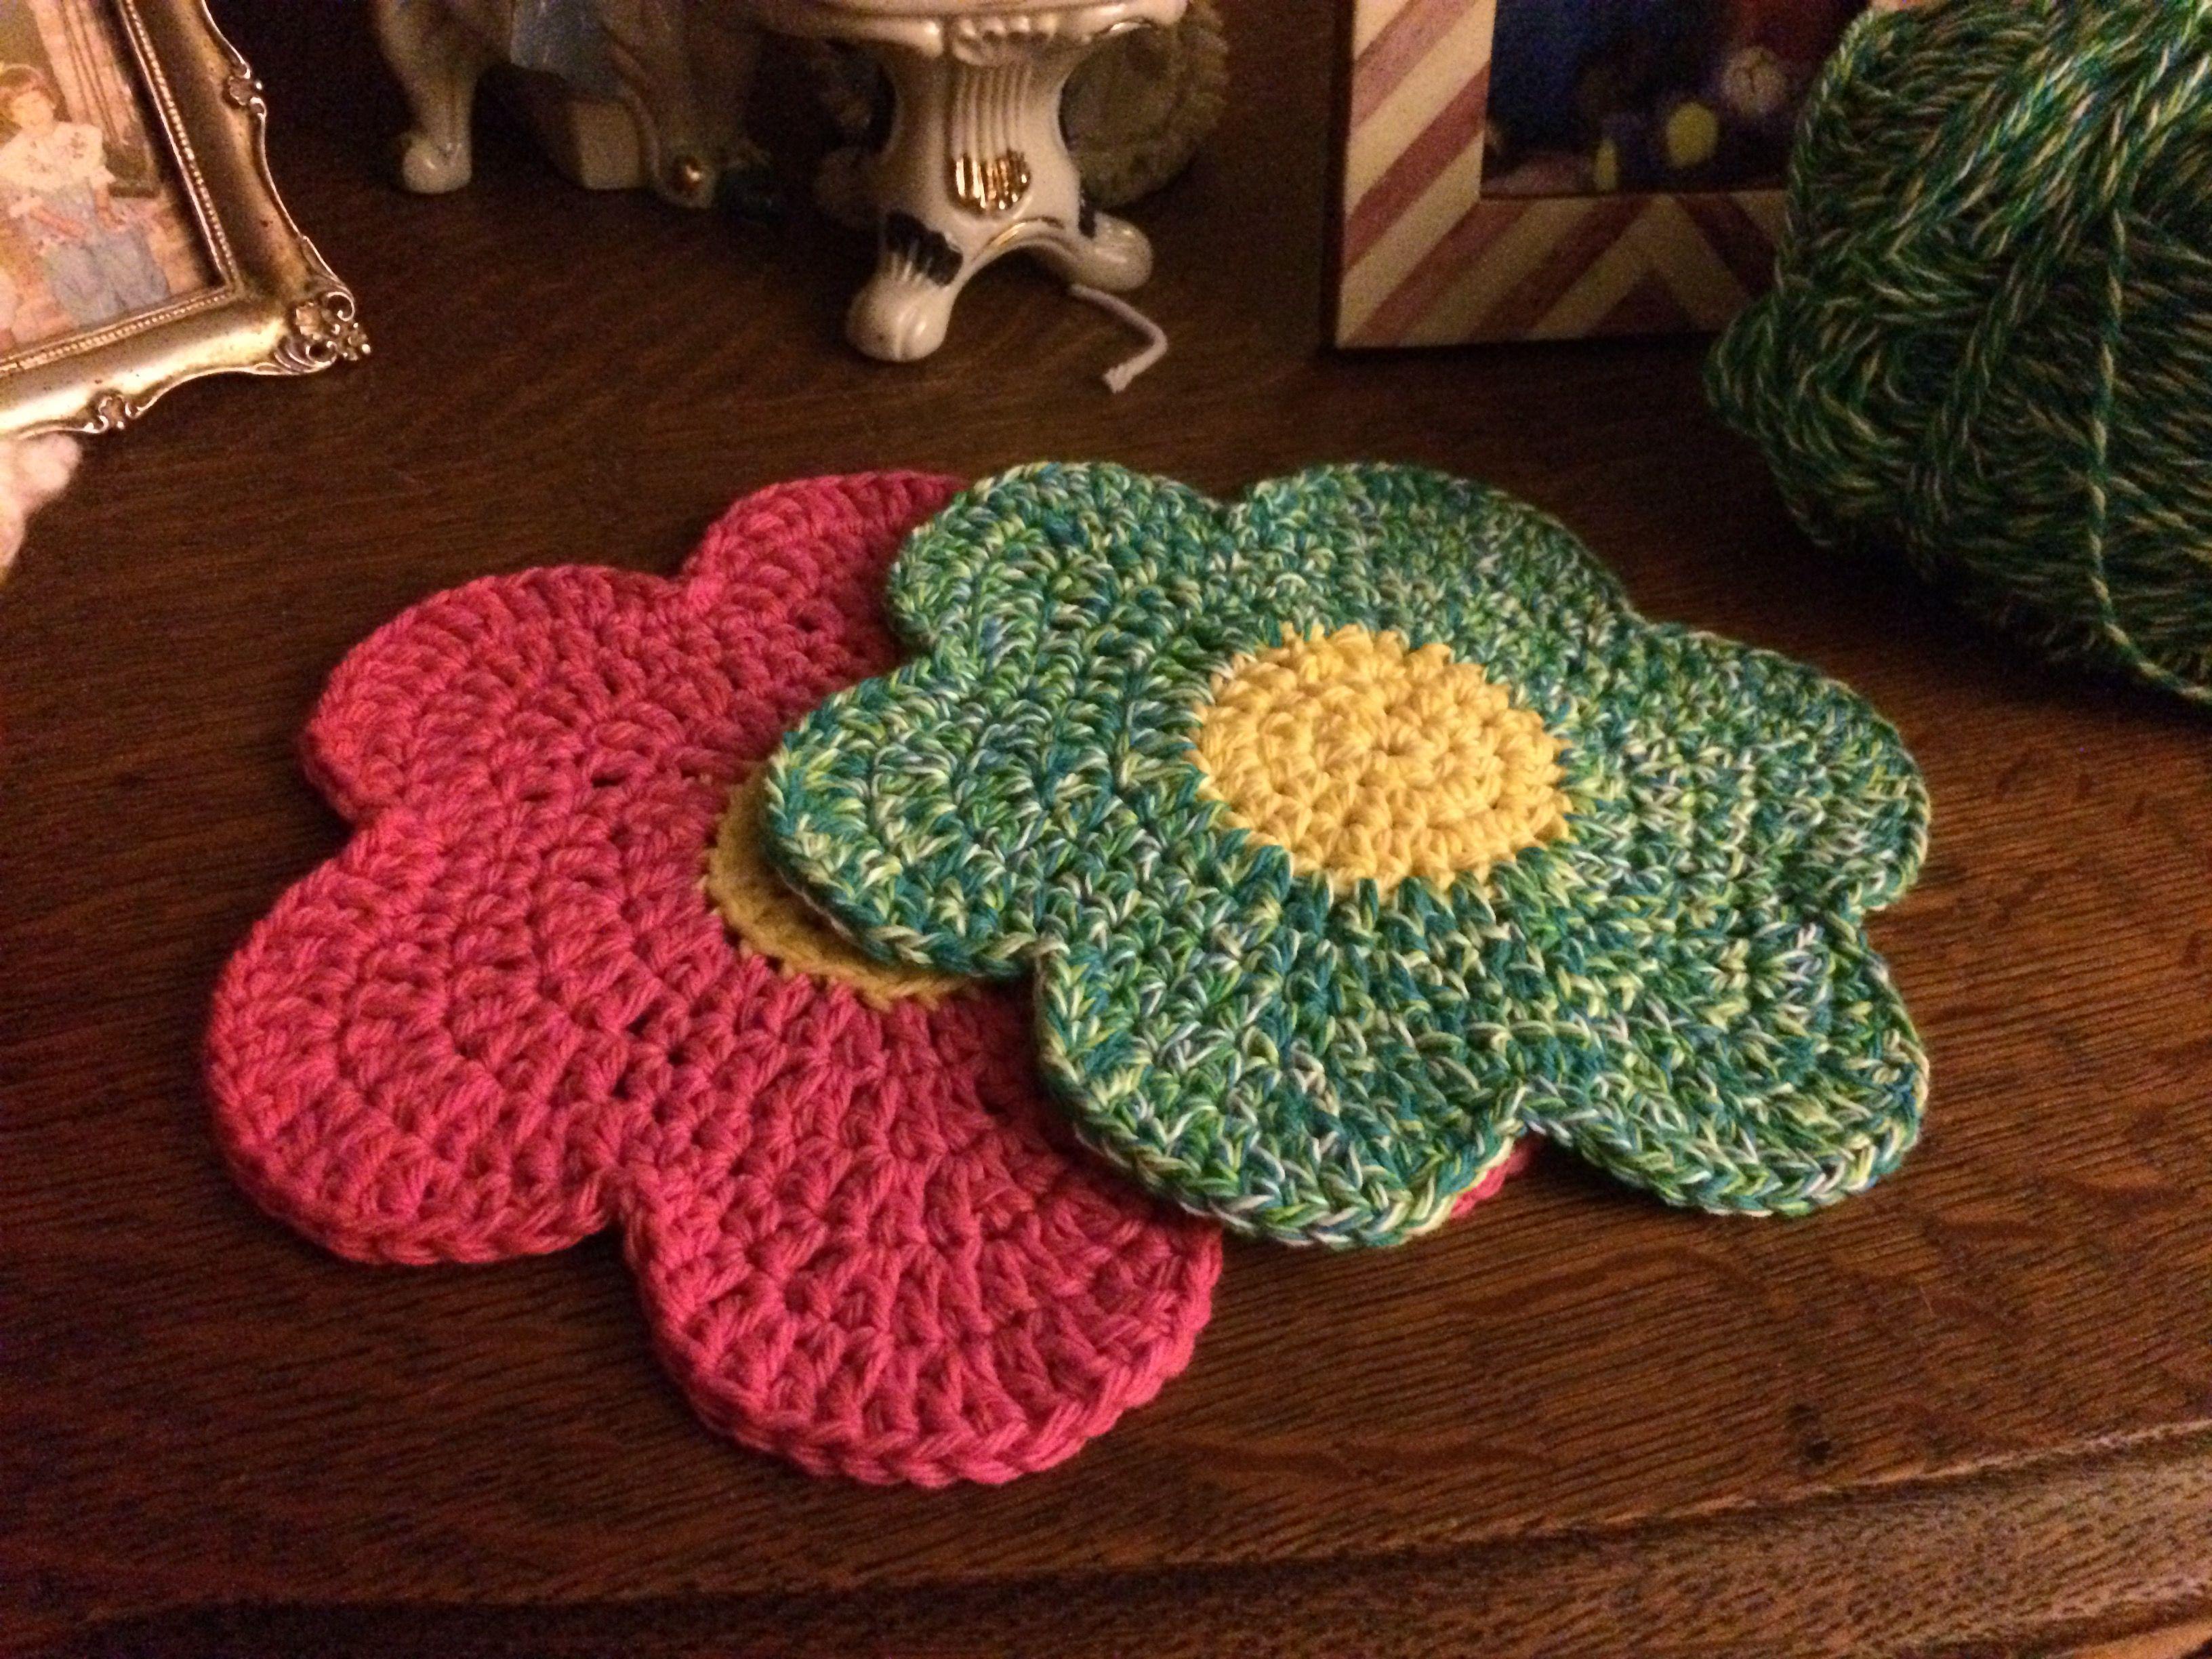 Crochet flower dishcloth $5 or 2 for $9.00 at Kimsittybittylife on etsy